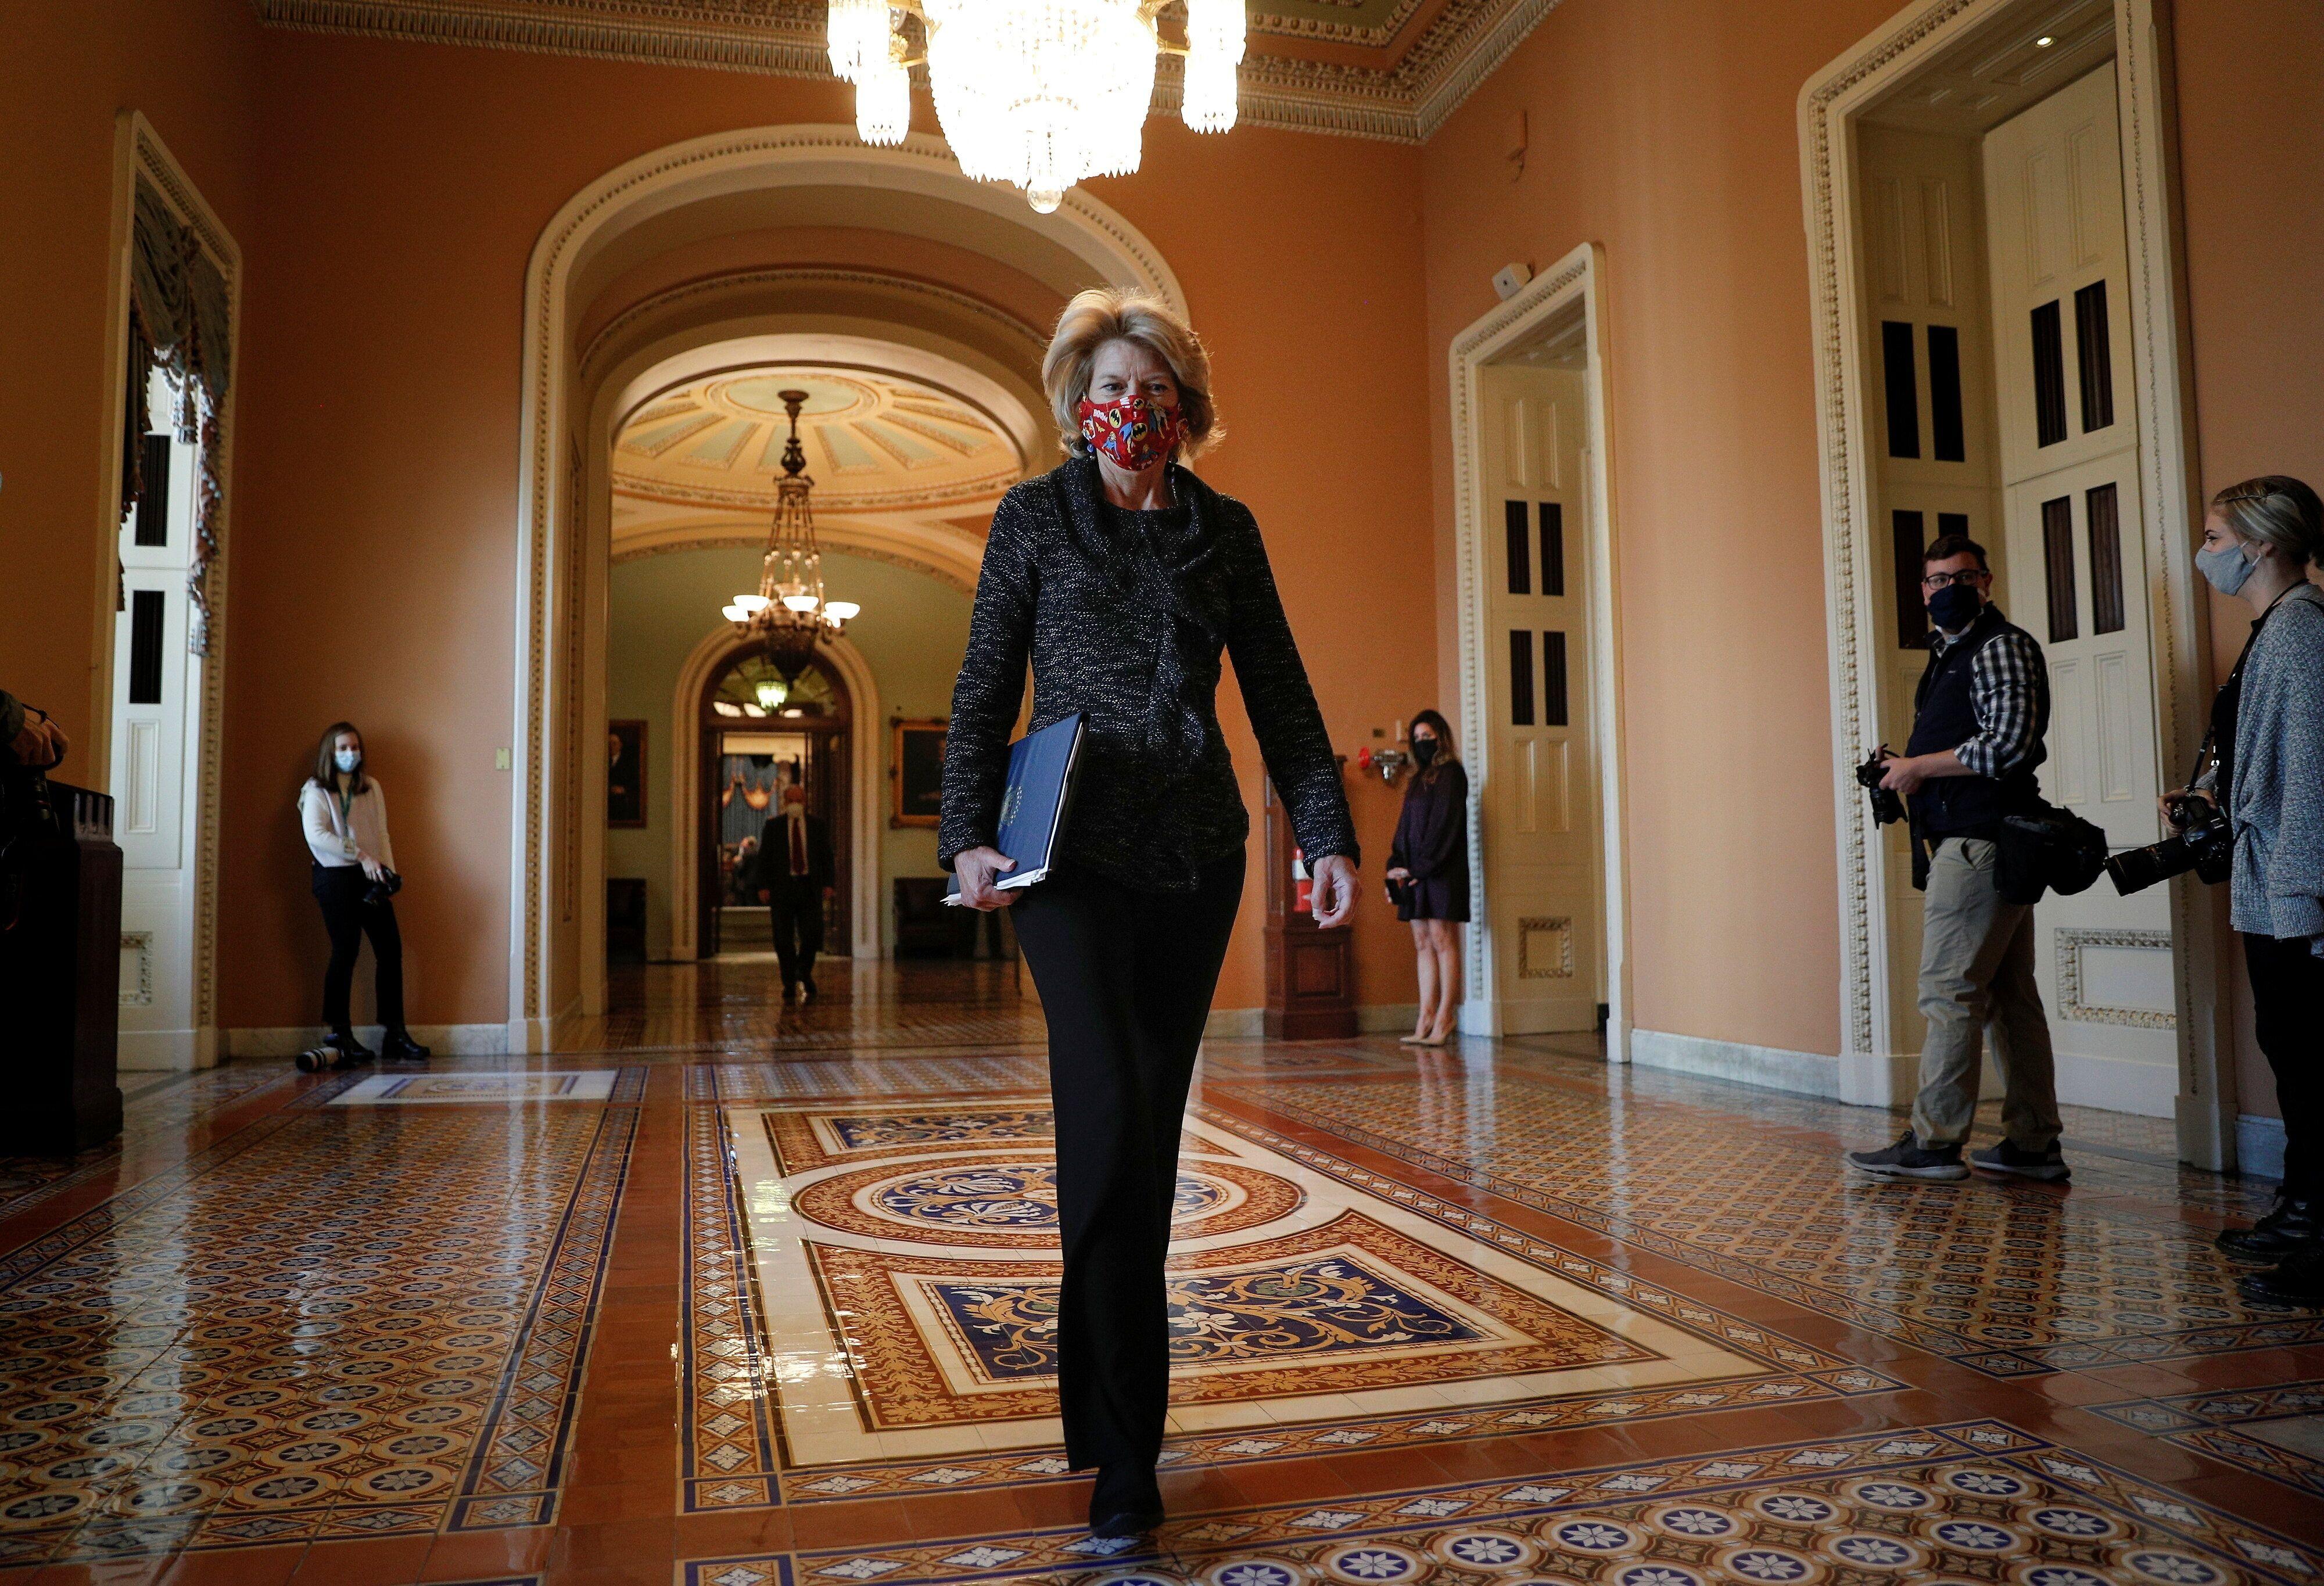 Senator Lisa Murkowski (R-AK) walks to the office of the Majority Leader from the Senate Chamber ahead of a meeting with Sena